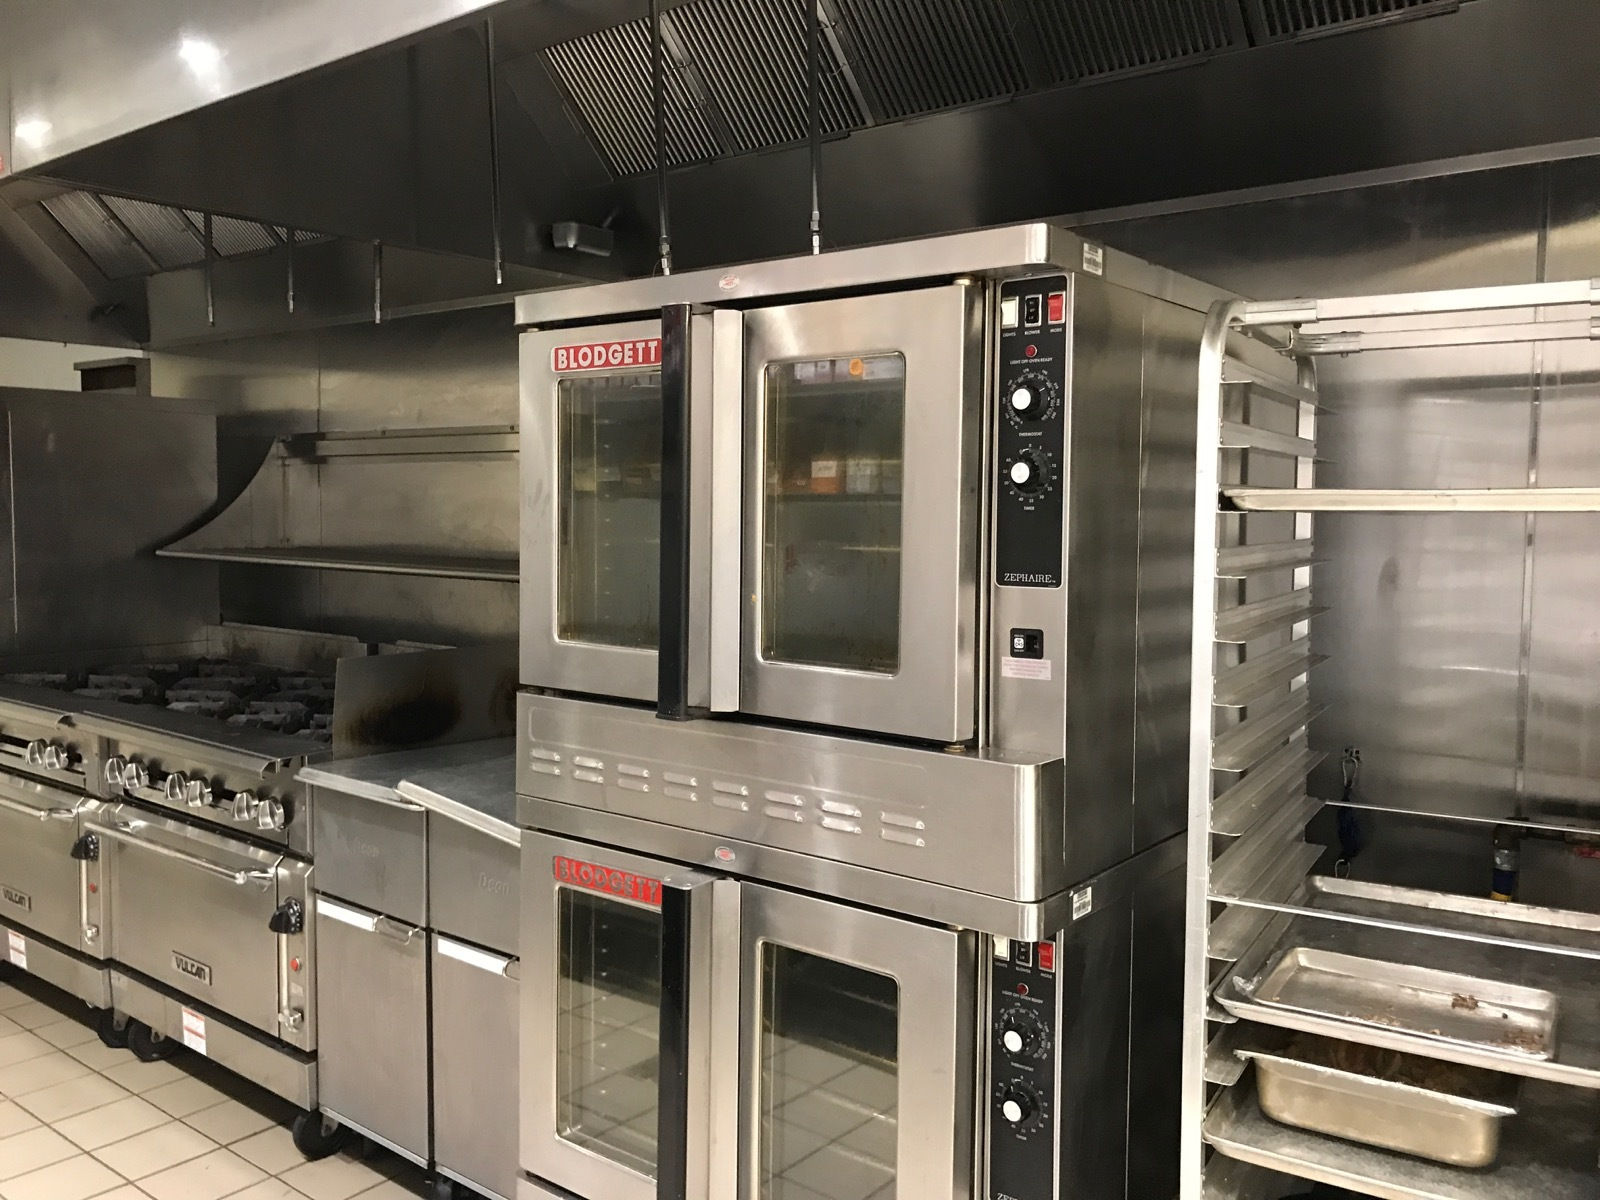 Chefscape Shared Kitchen